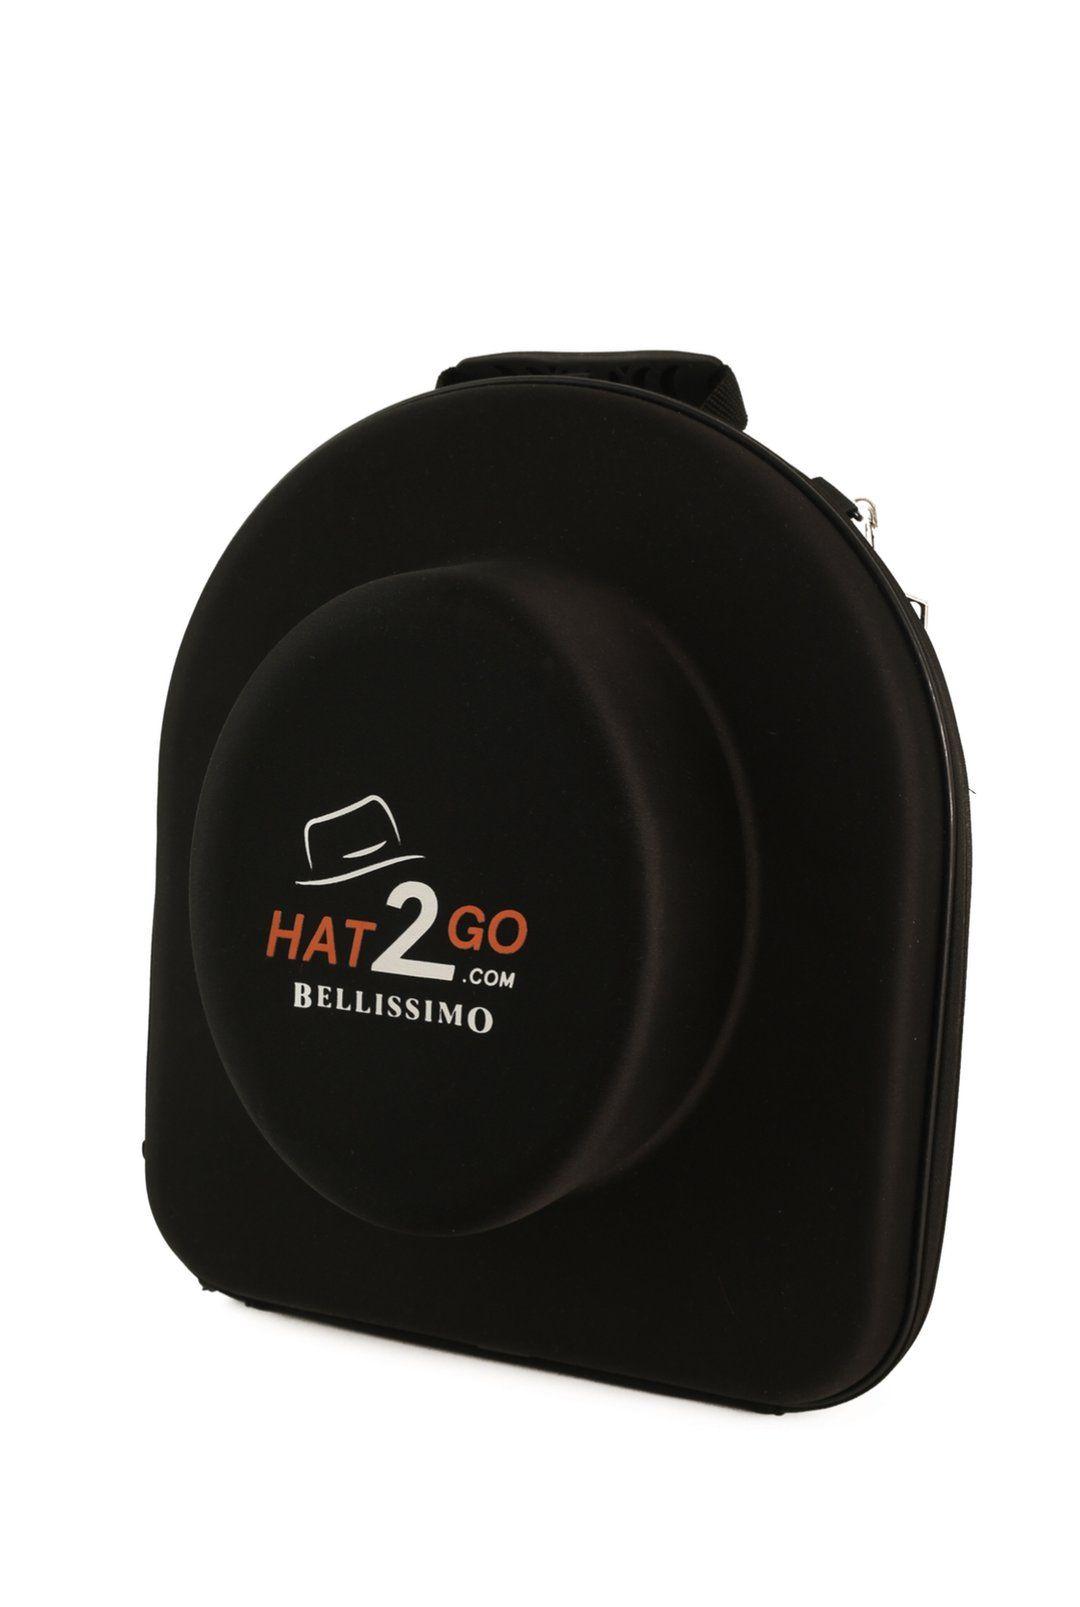 Hat Box Travel Fedora Case Universal Carrier For Hats Carry On Bag Men Women Man Bag Hat Box Carry On Bag